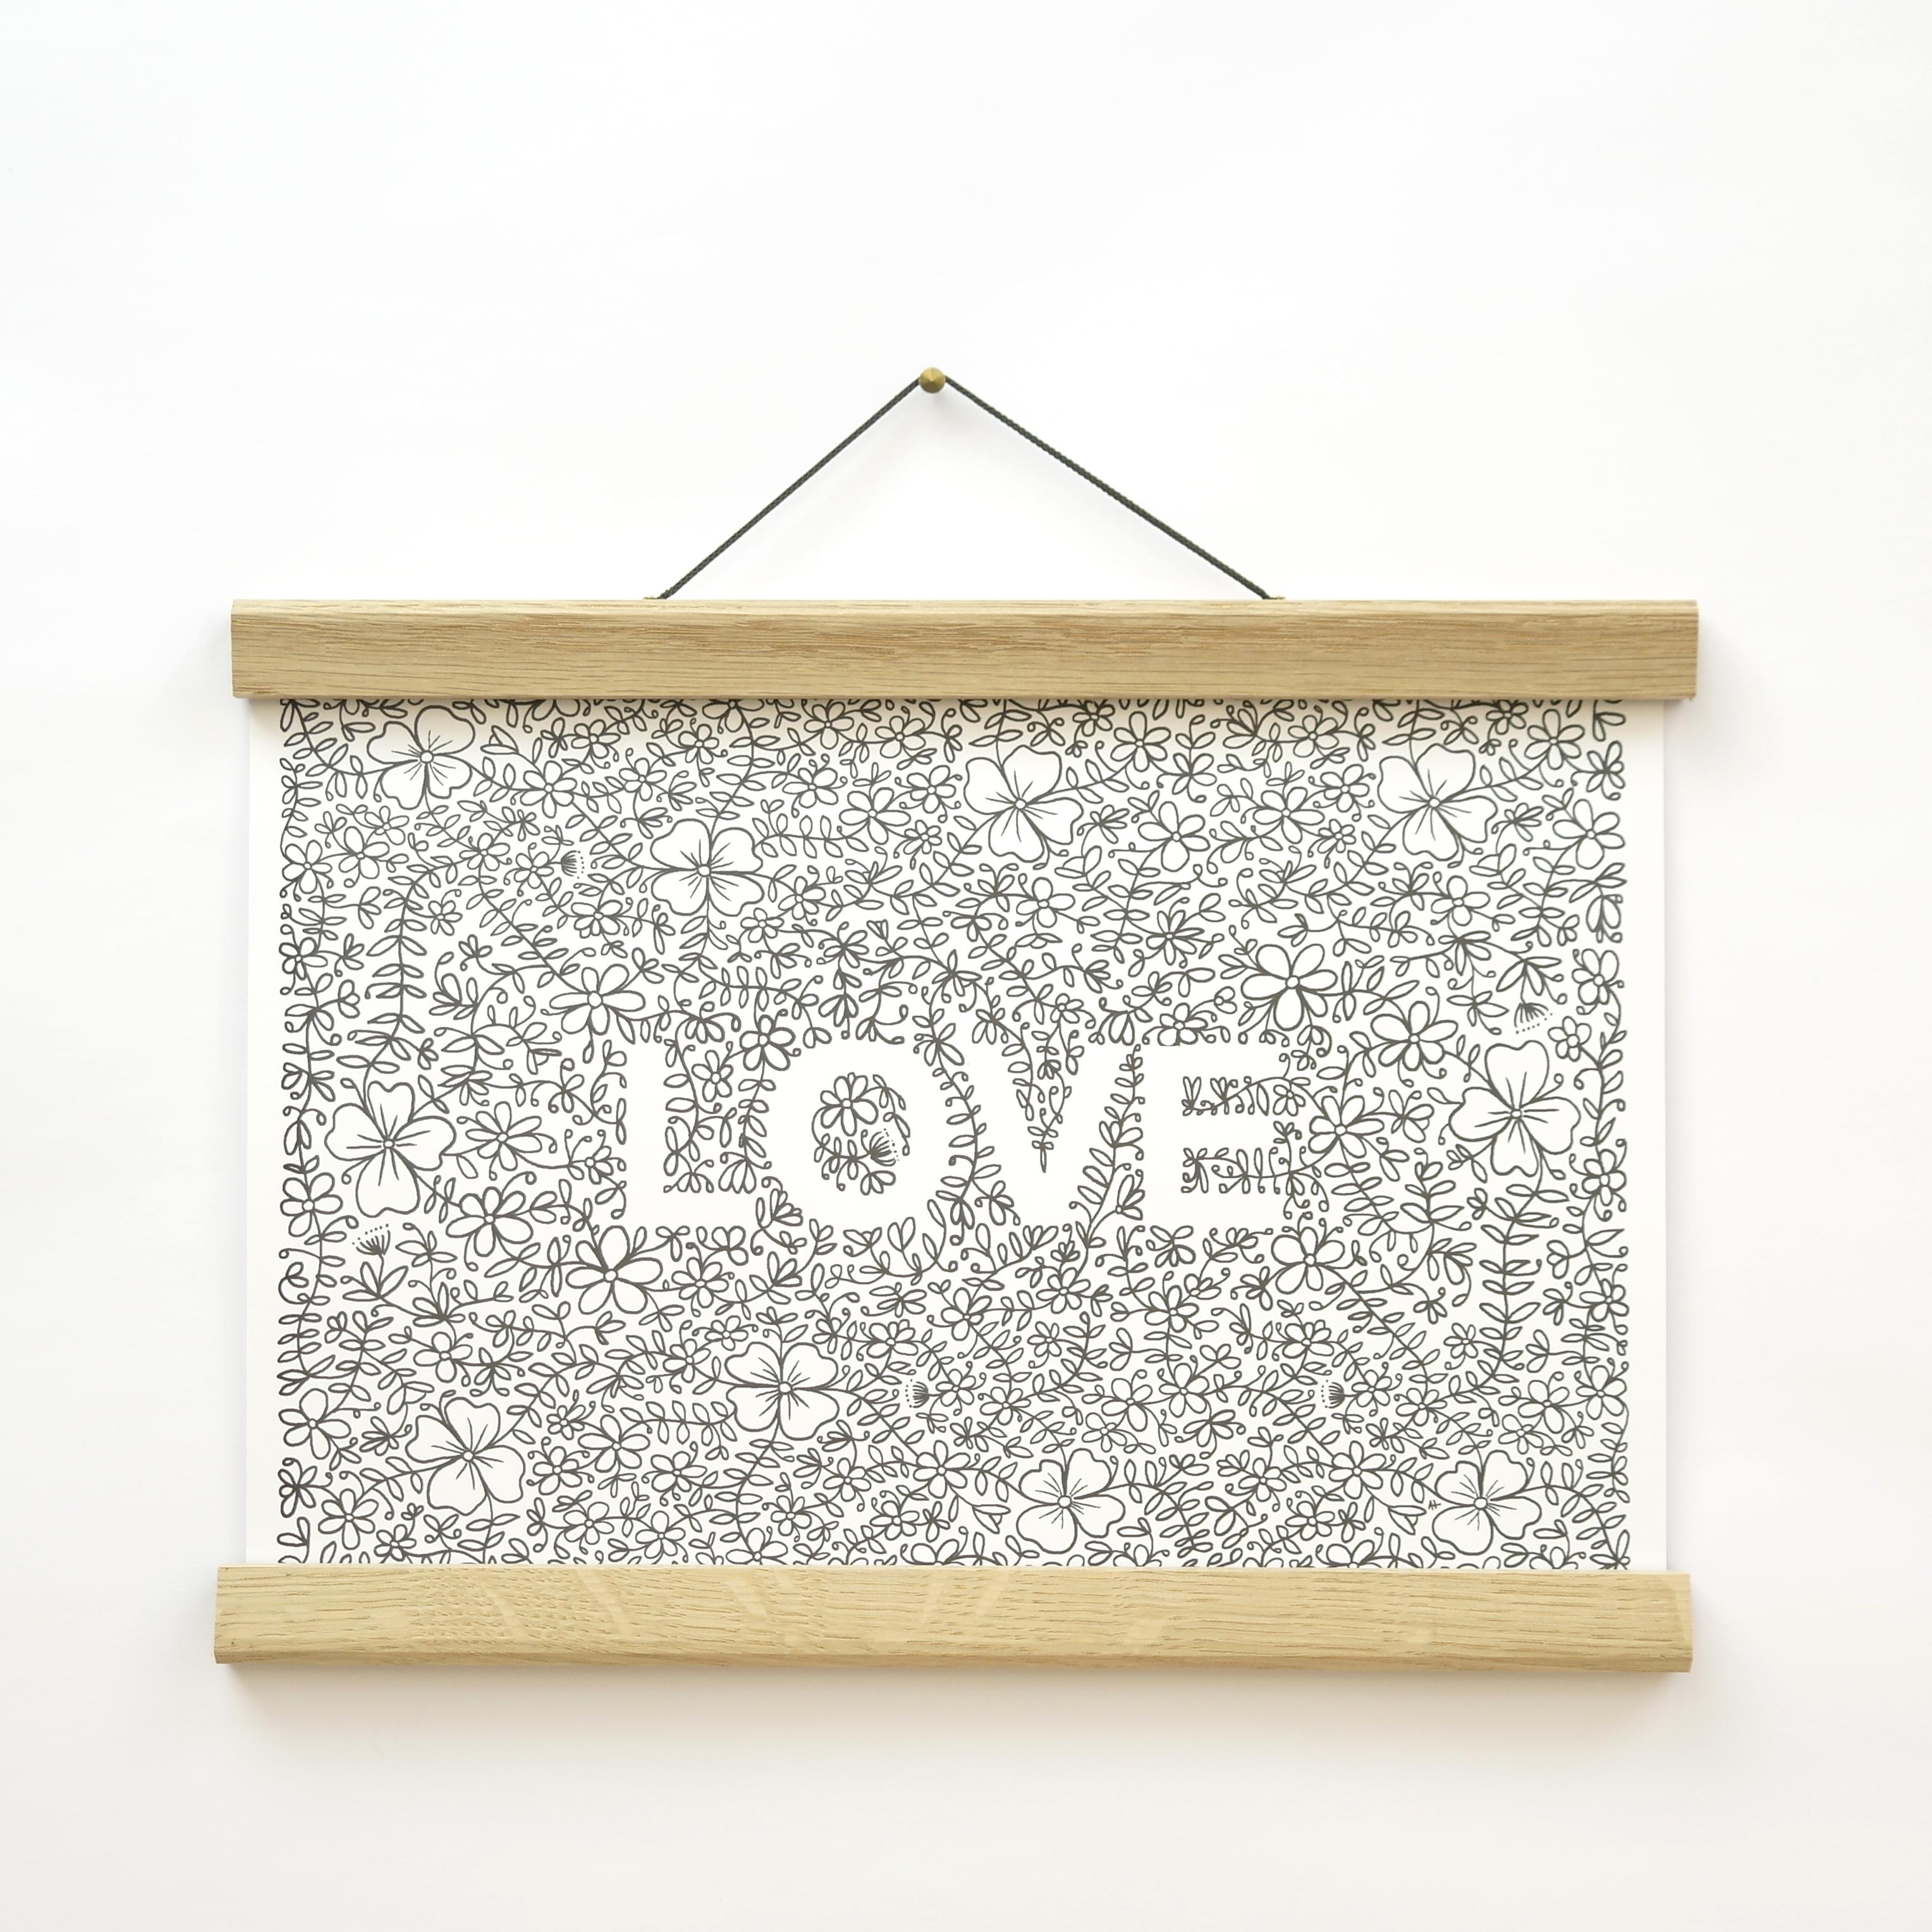 'Love' A4 Floral Print (unframed)